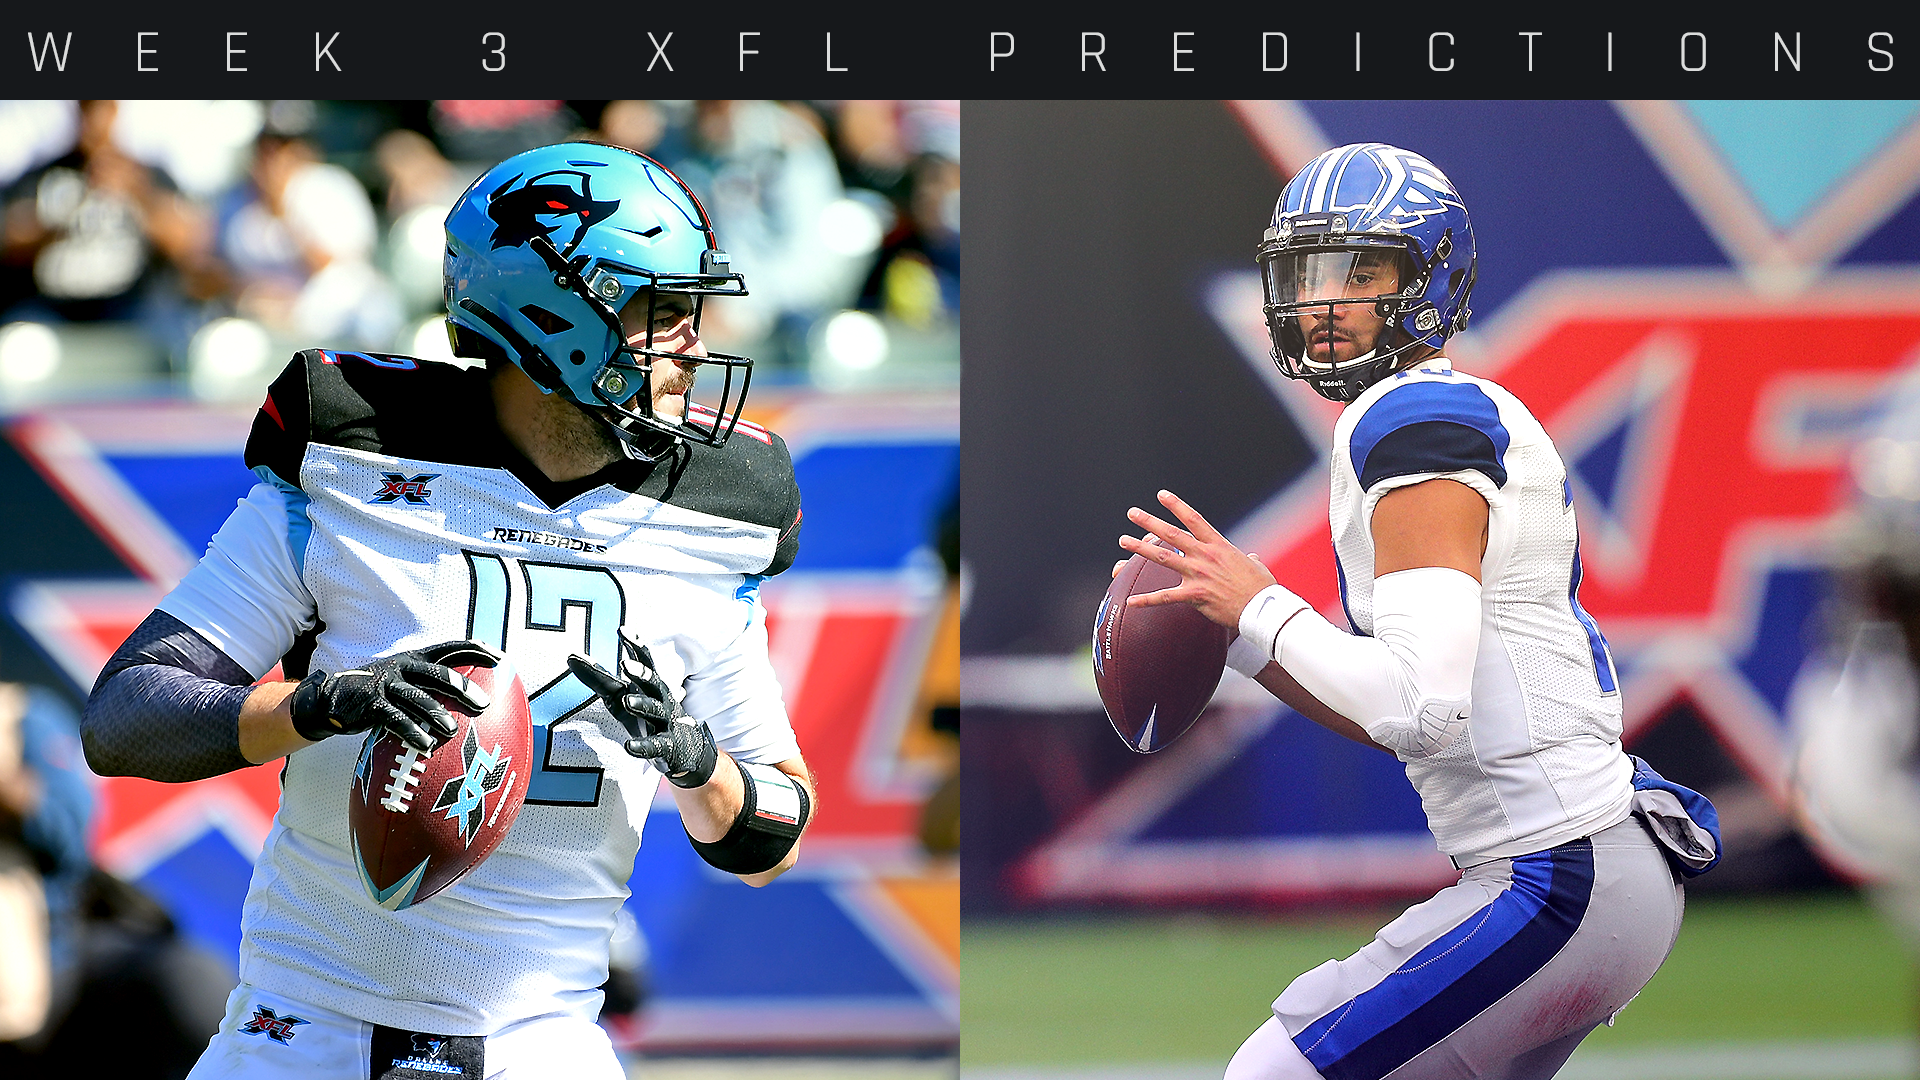 XFL Week 3 odds, picks, predictions: Houston Roughnecks, DC Defenders continue domination